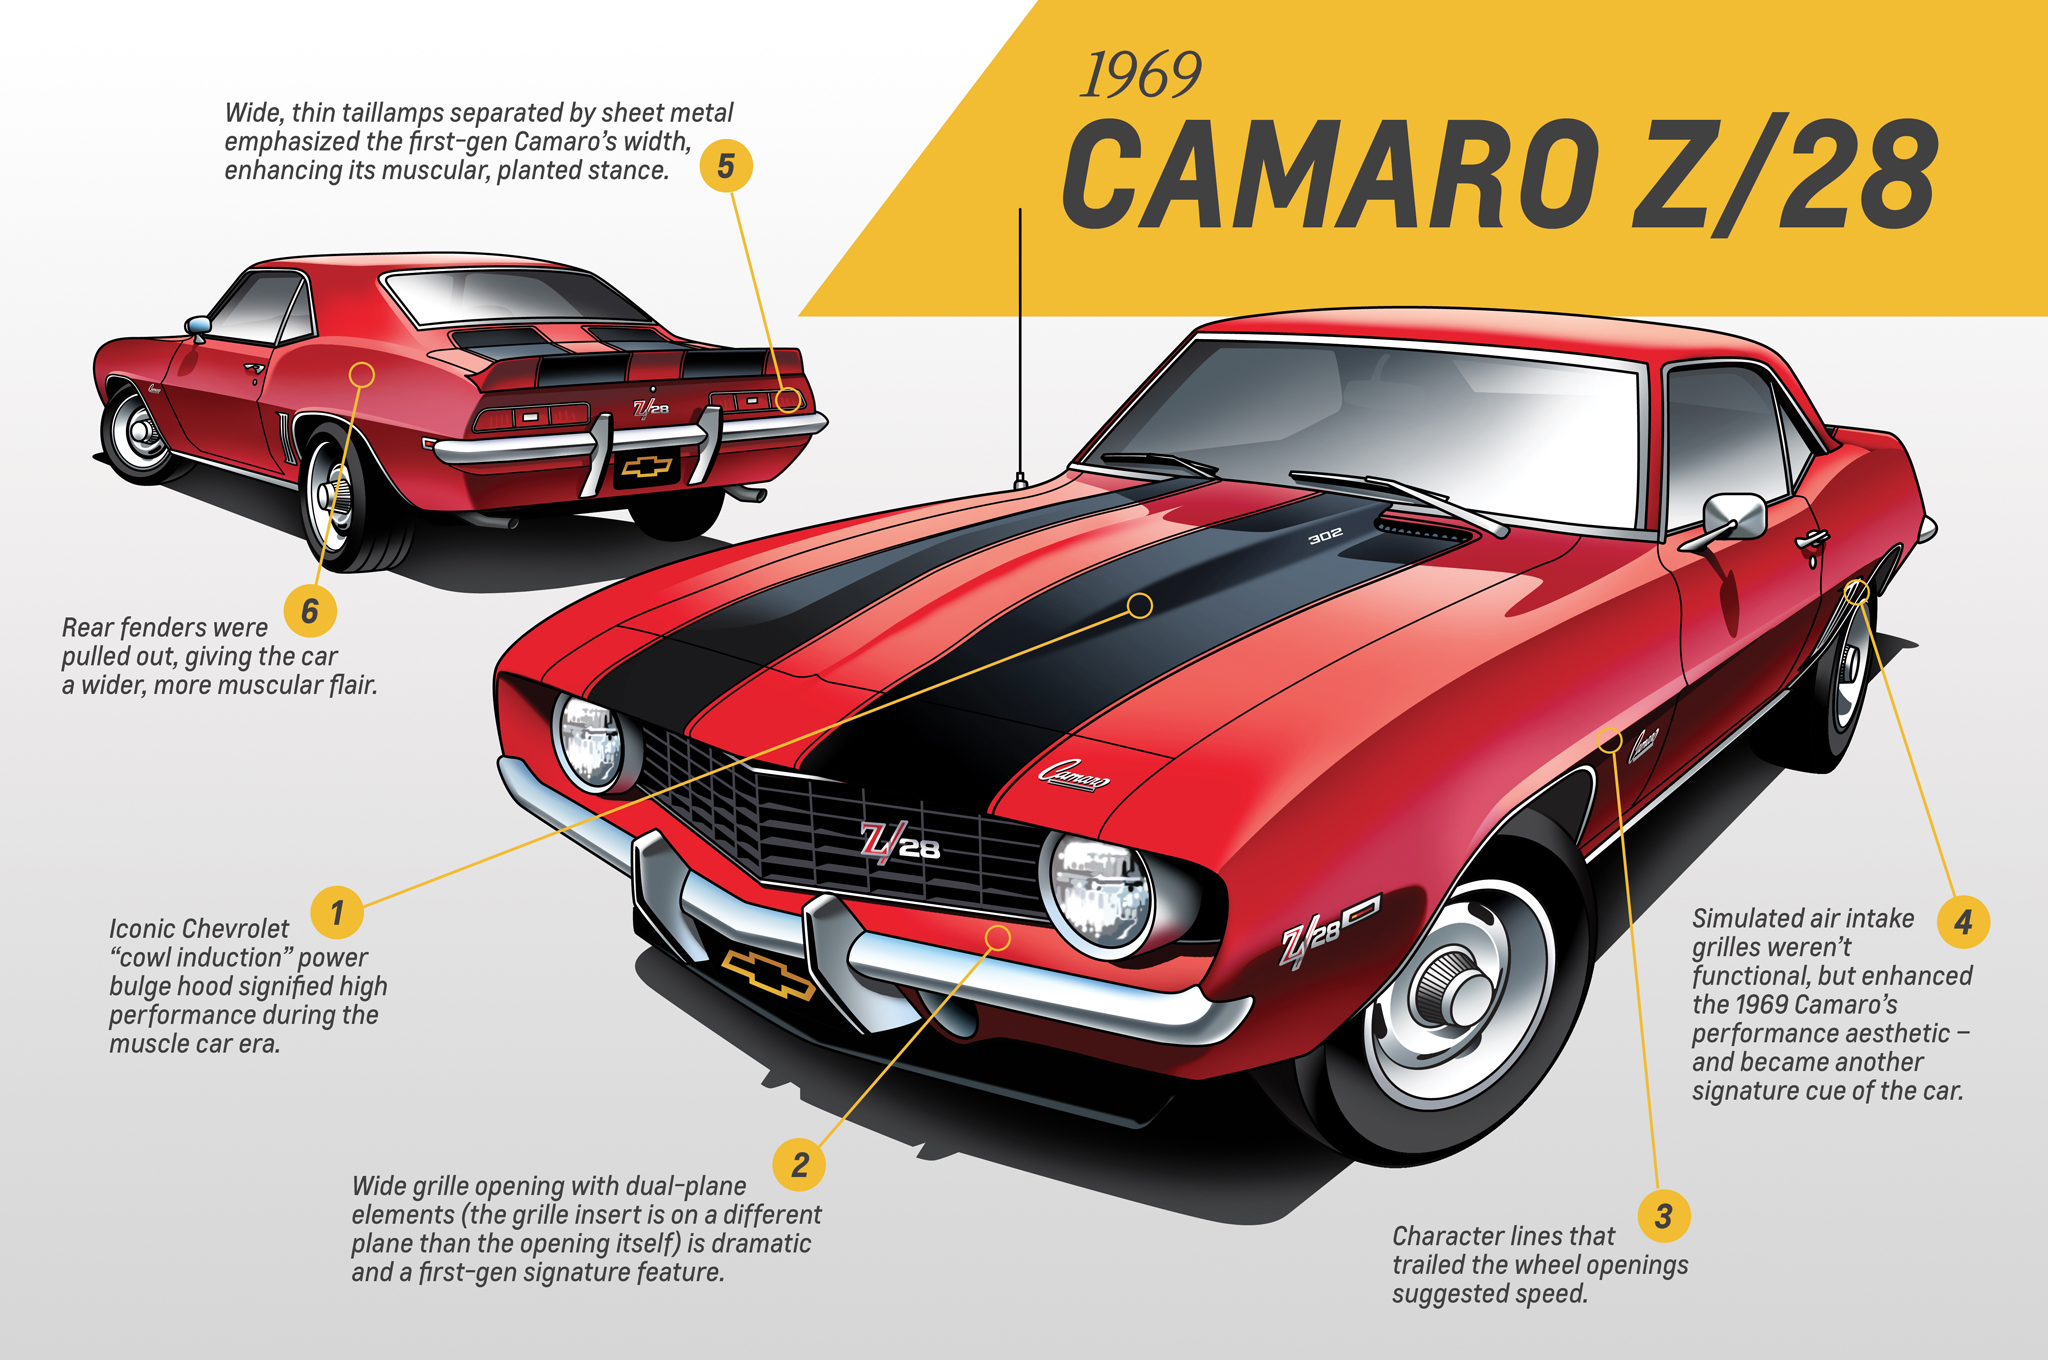 Chevrolet Celebrates Five Generations of the Iconic Camaro